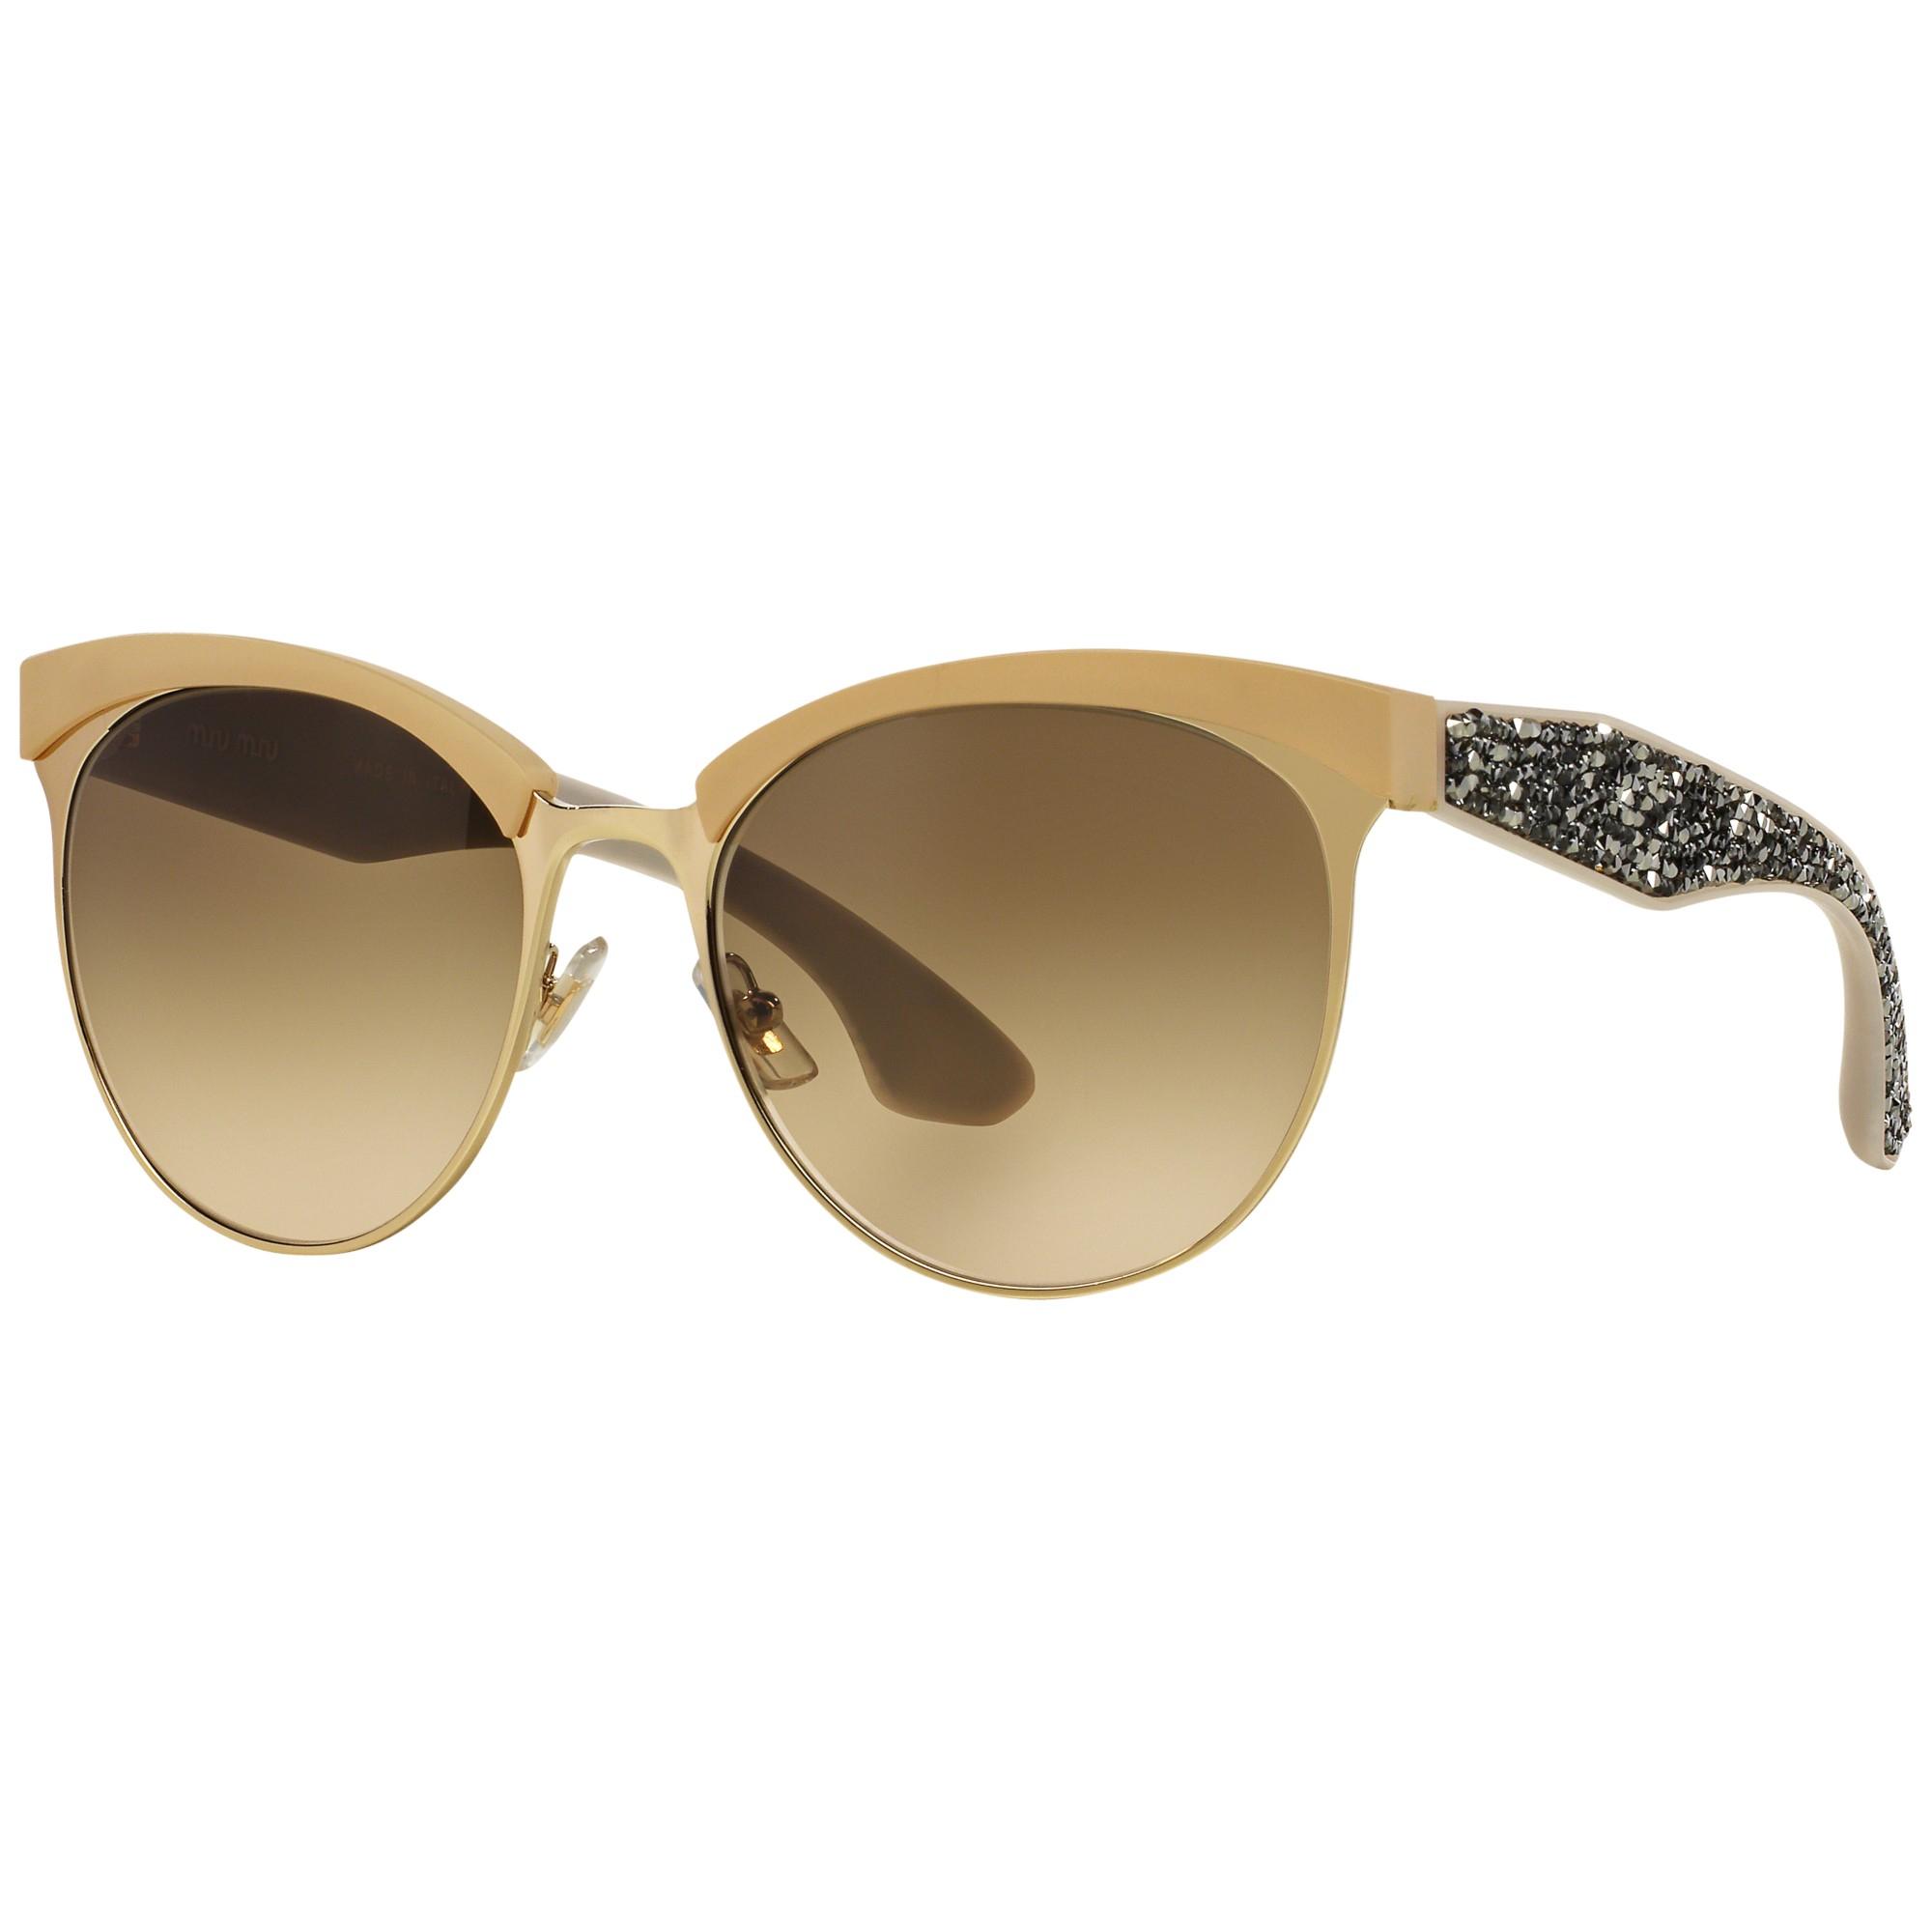 382044e97b97 Miu Miu Mu54Qs Stardust Bead Encrusted Sunglasses in Brown - Lyst